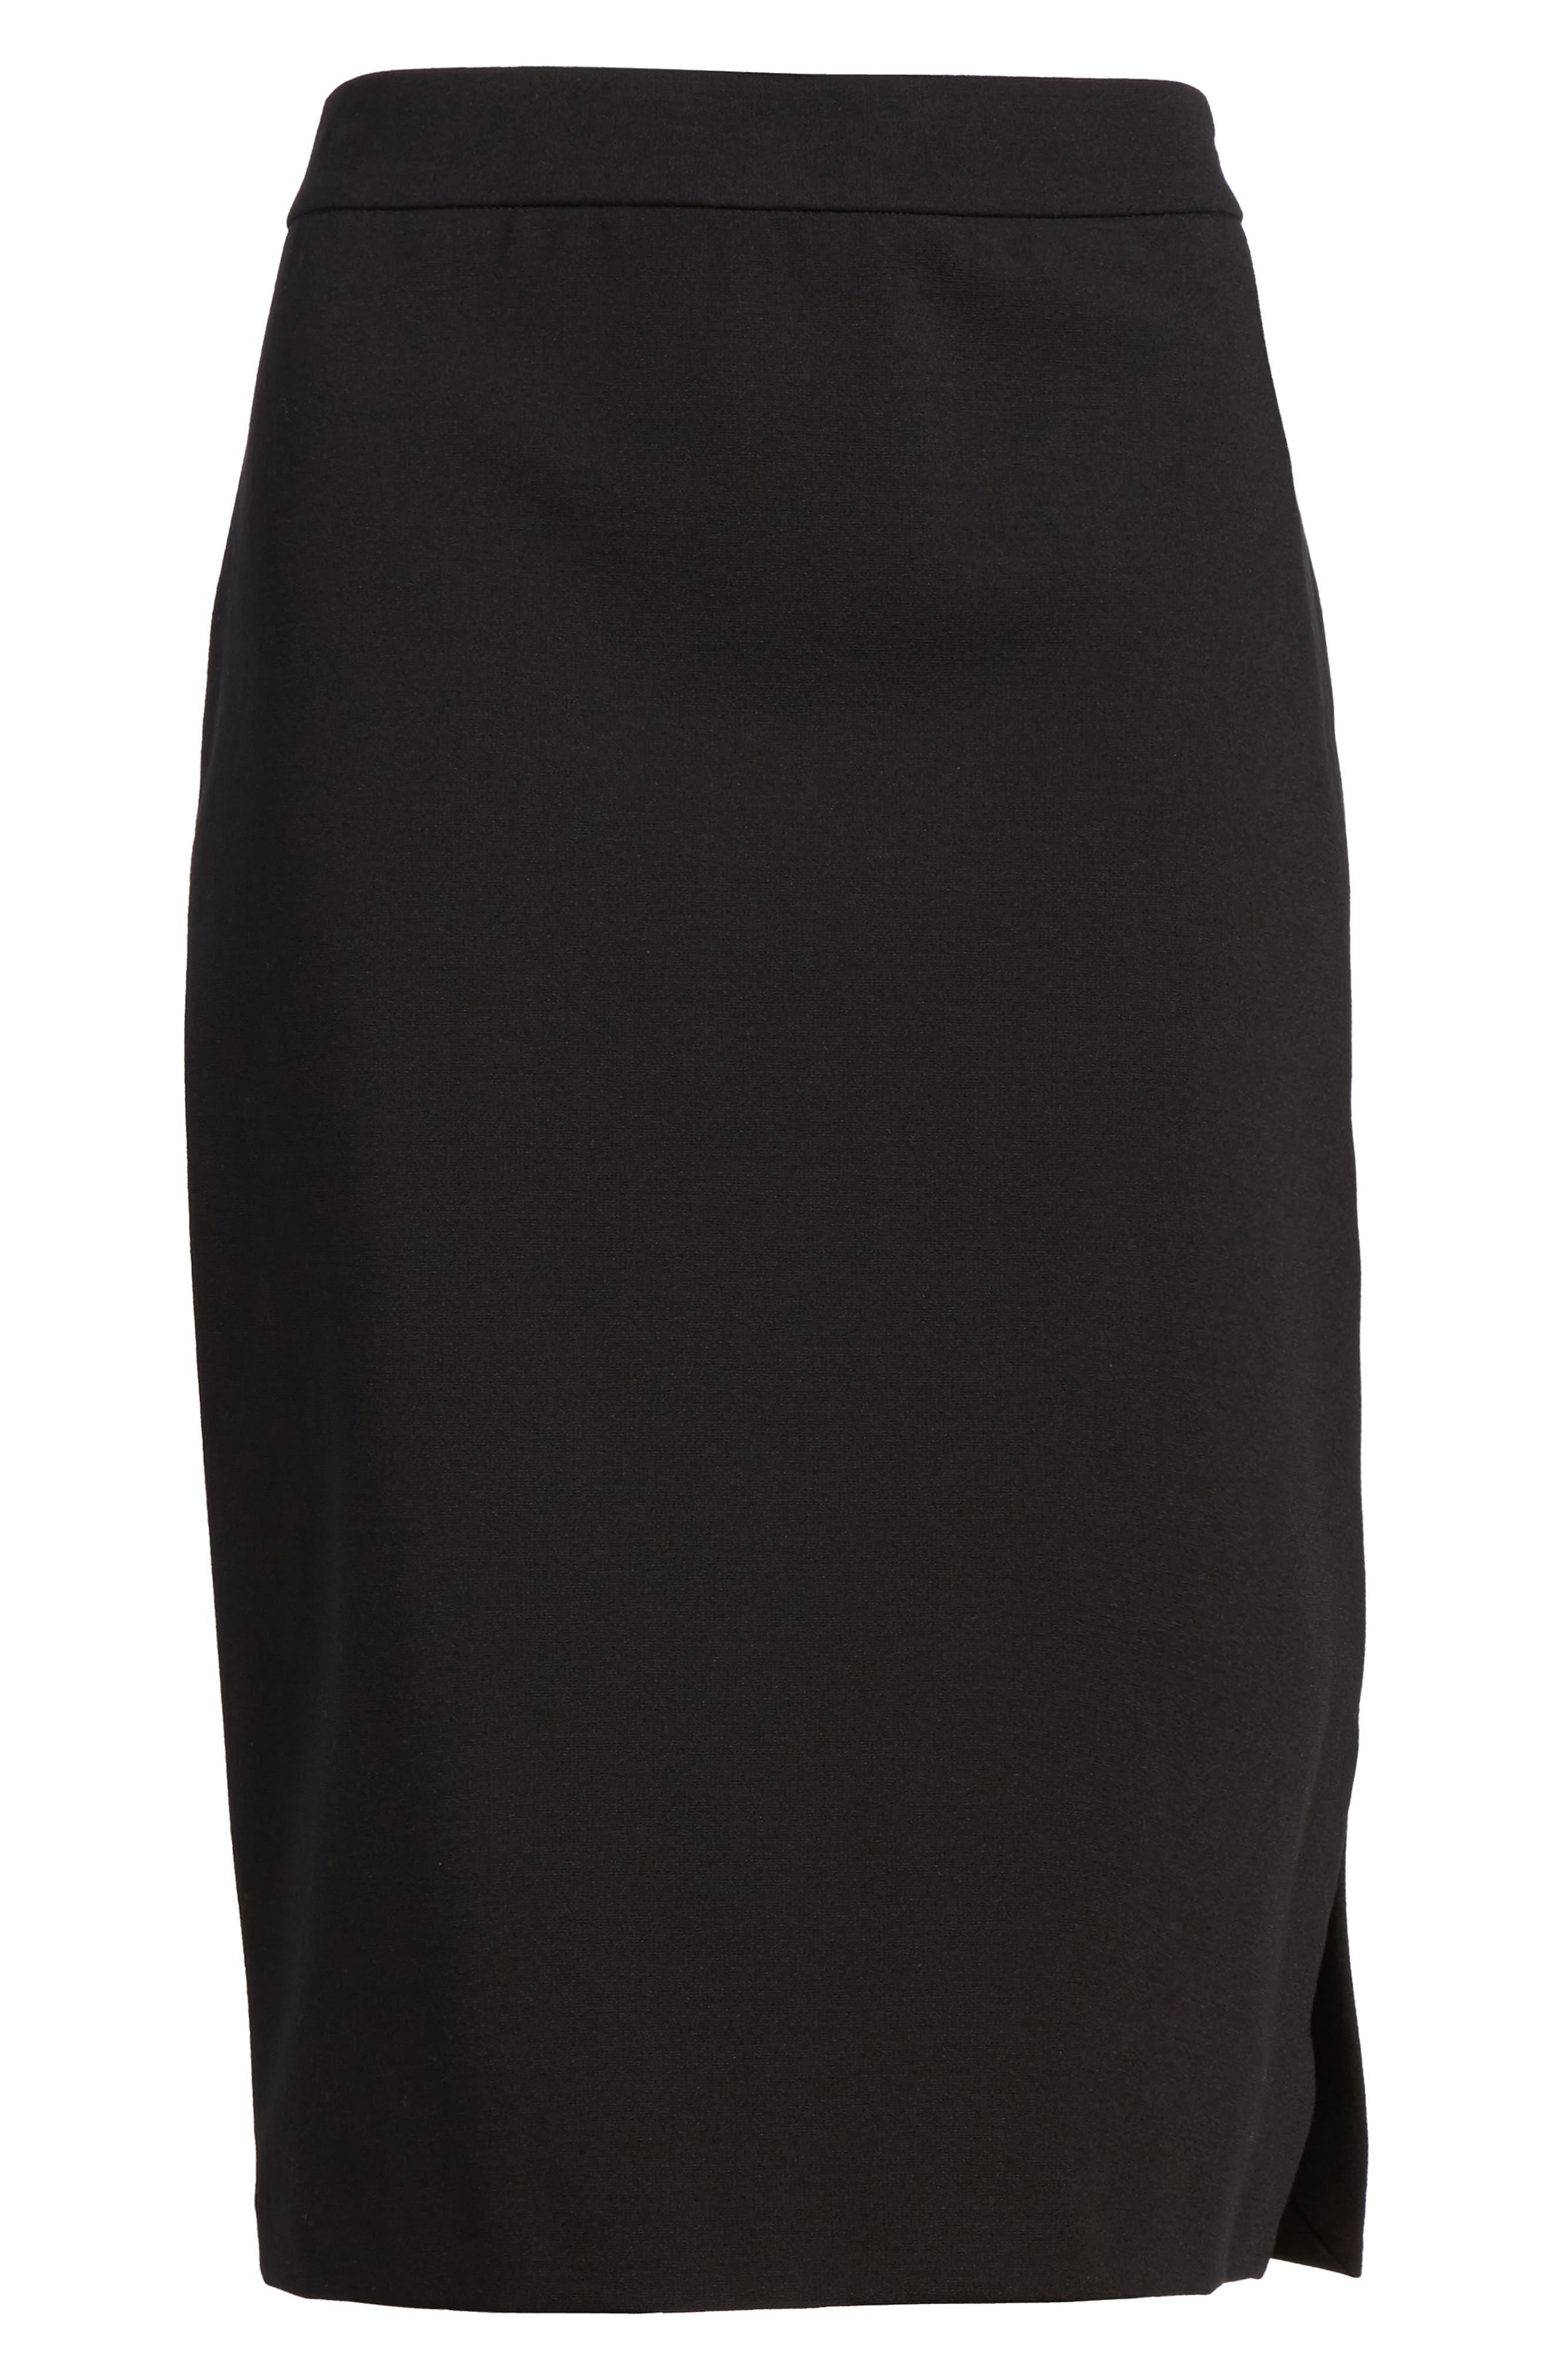 Tencel<sup>®</sup> Blend Pencil Skirt,                             Alternate thumbnail 6, color,                             001